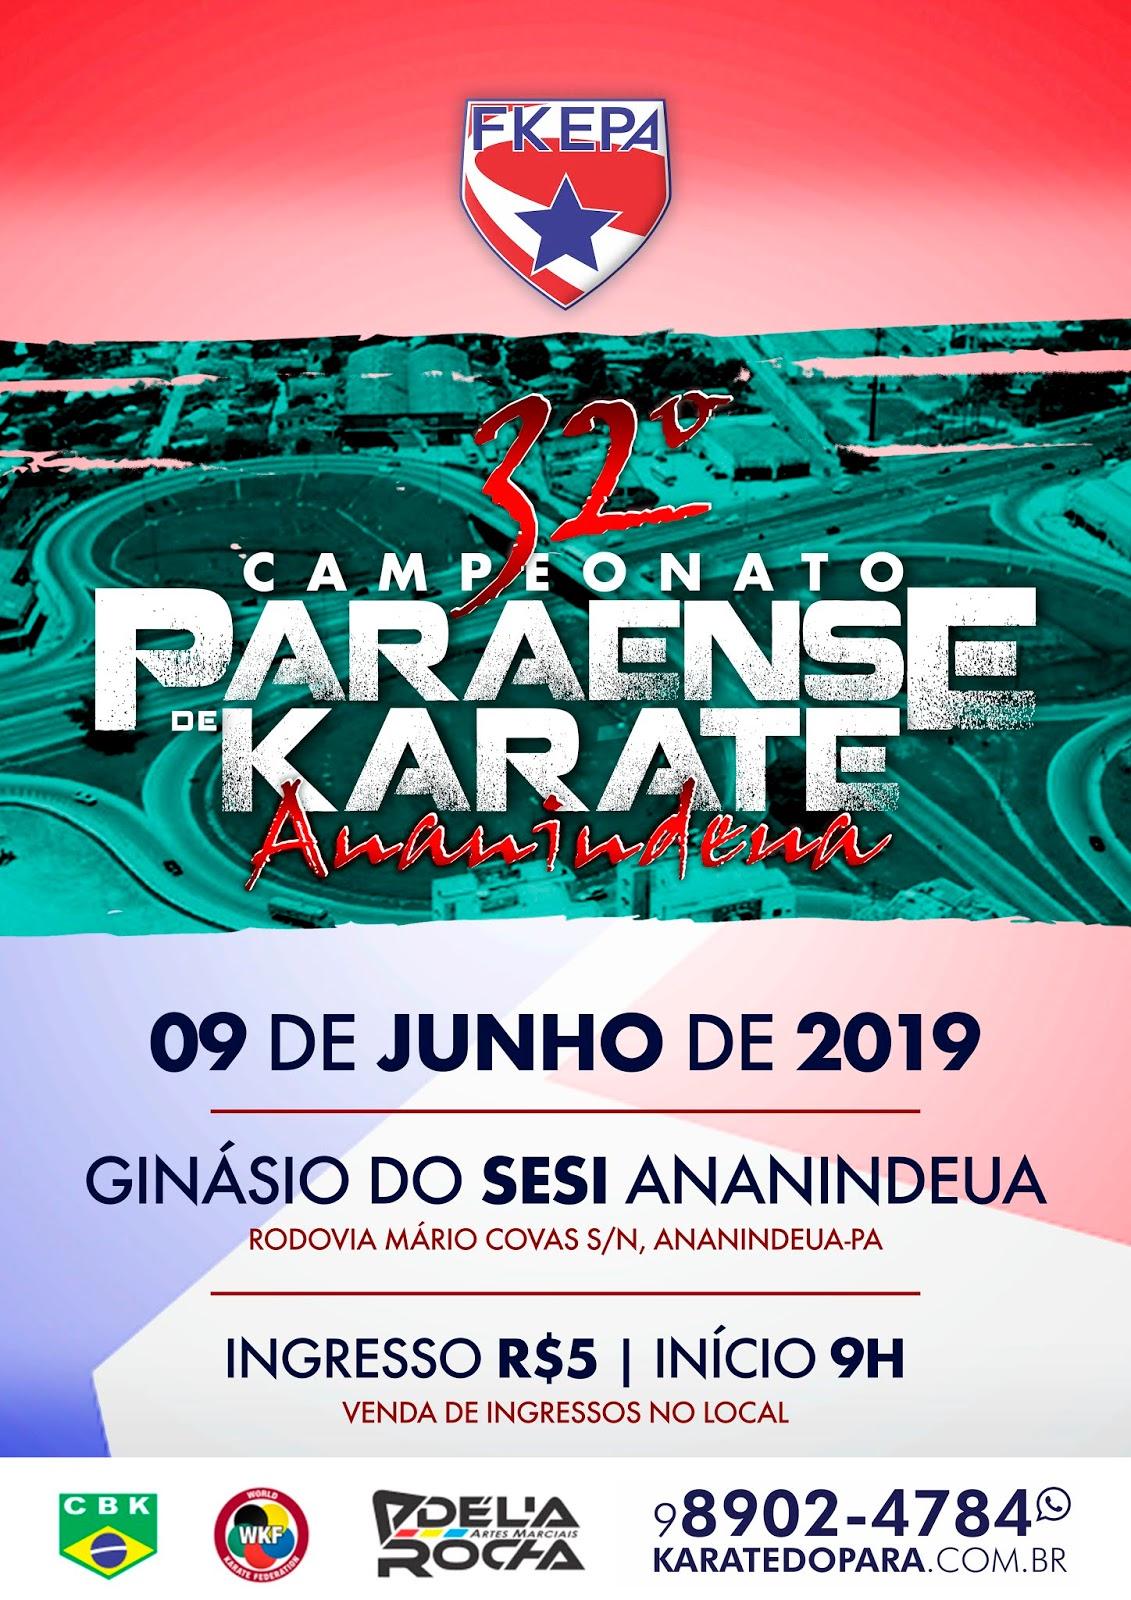 Campeonato Paraense de Karate - 2ª Etapa